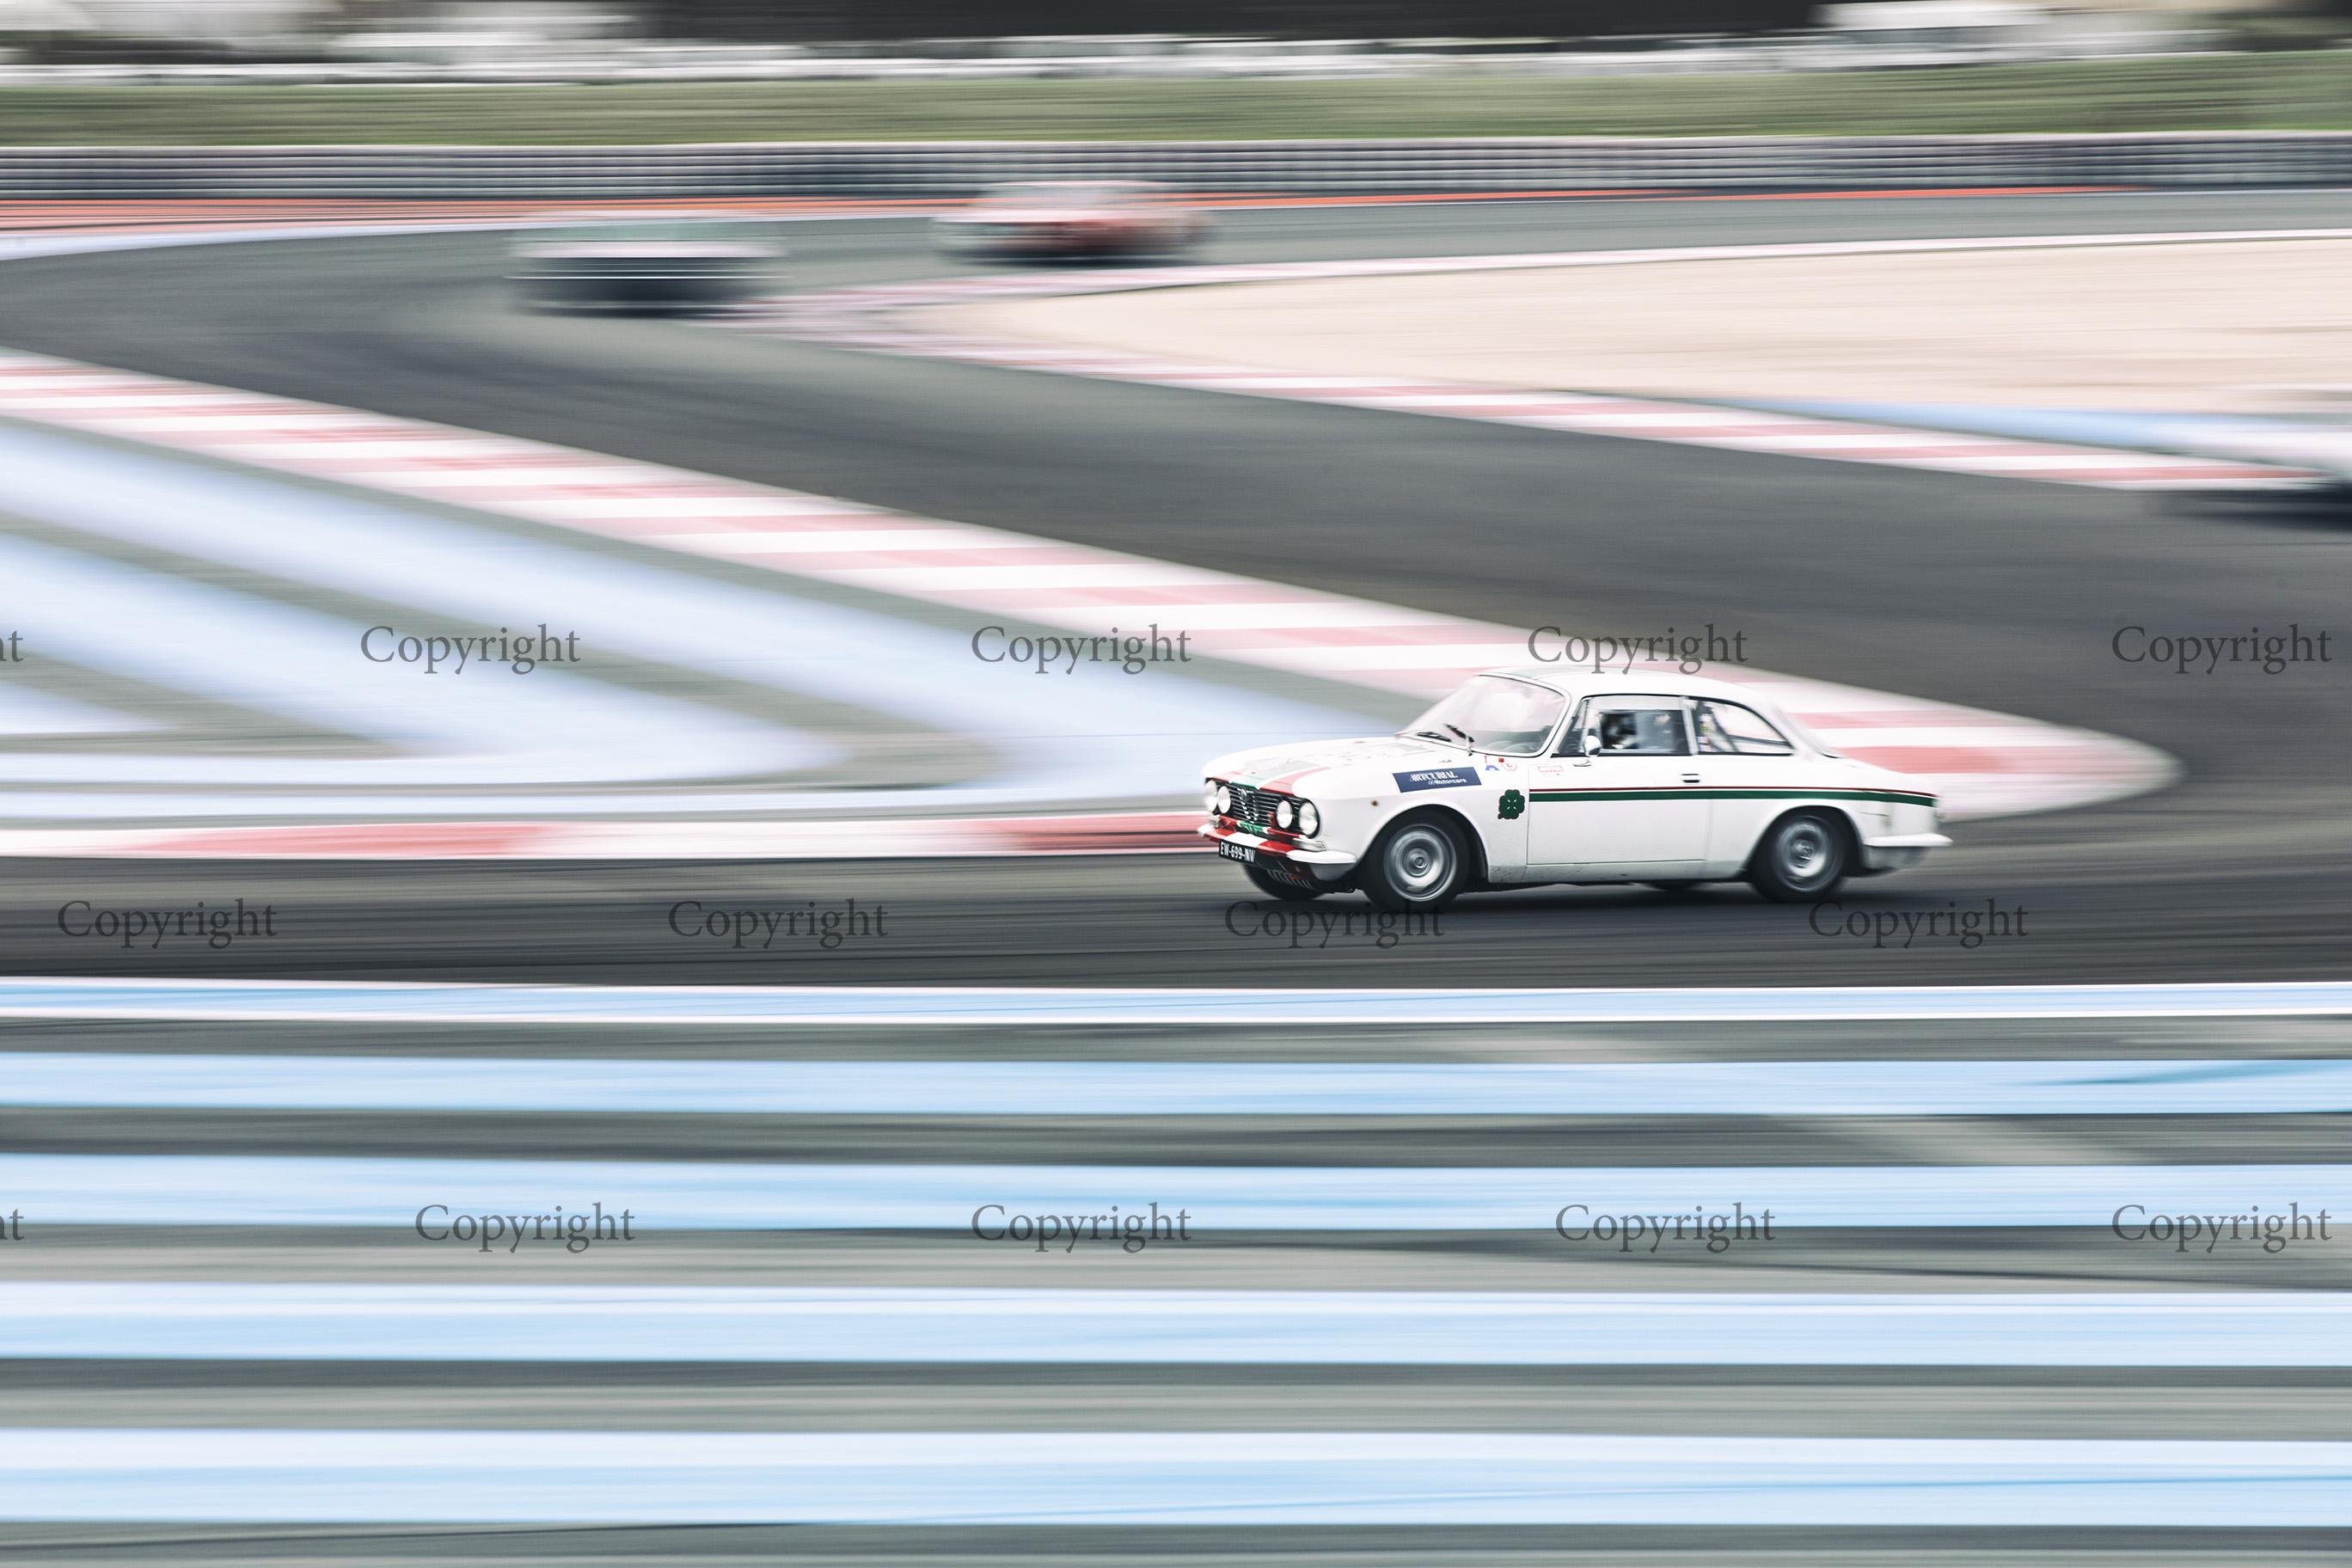 2000 GTV 1972 +